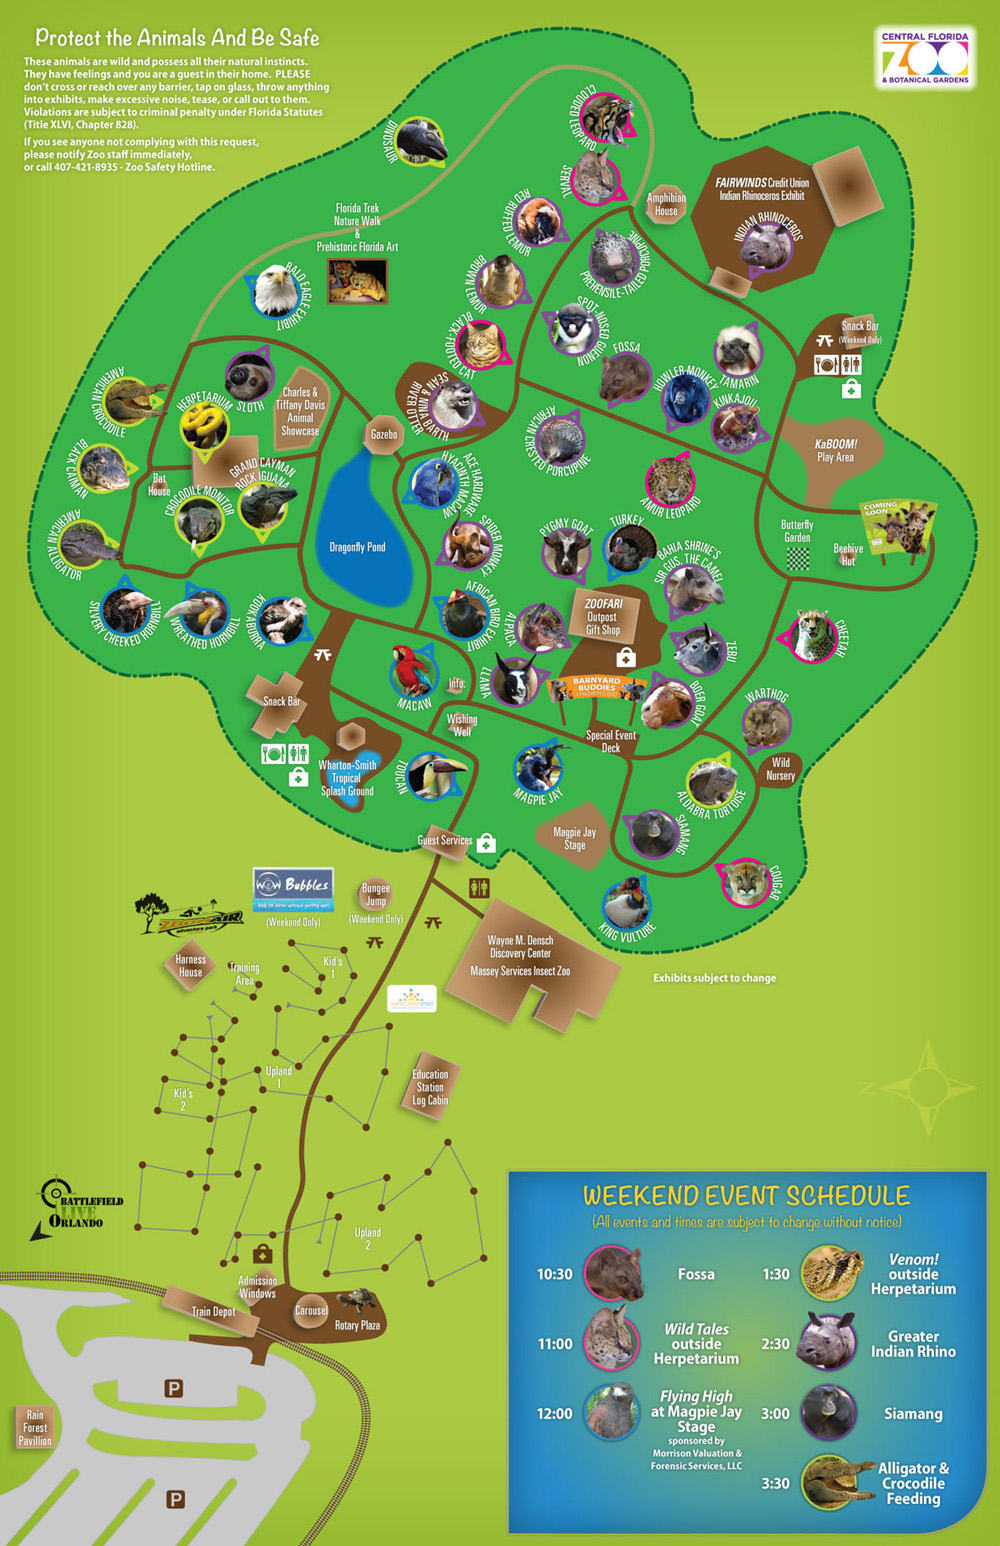 Les Zoos Dans Le Monde - Central Florida Zoo And Botanical Gardens - Florida Botanical Gardens Map